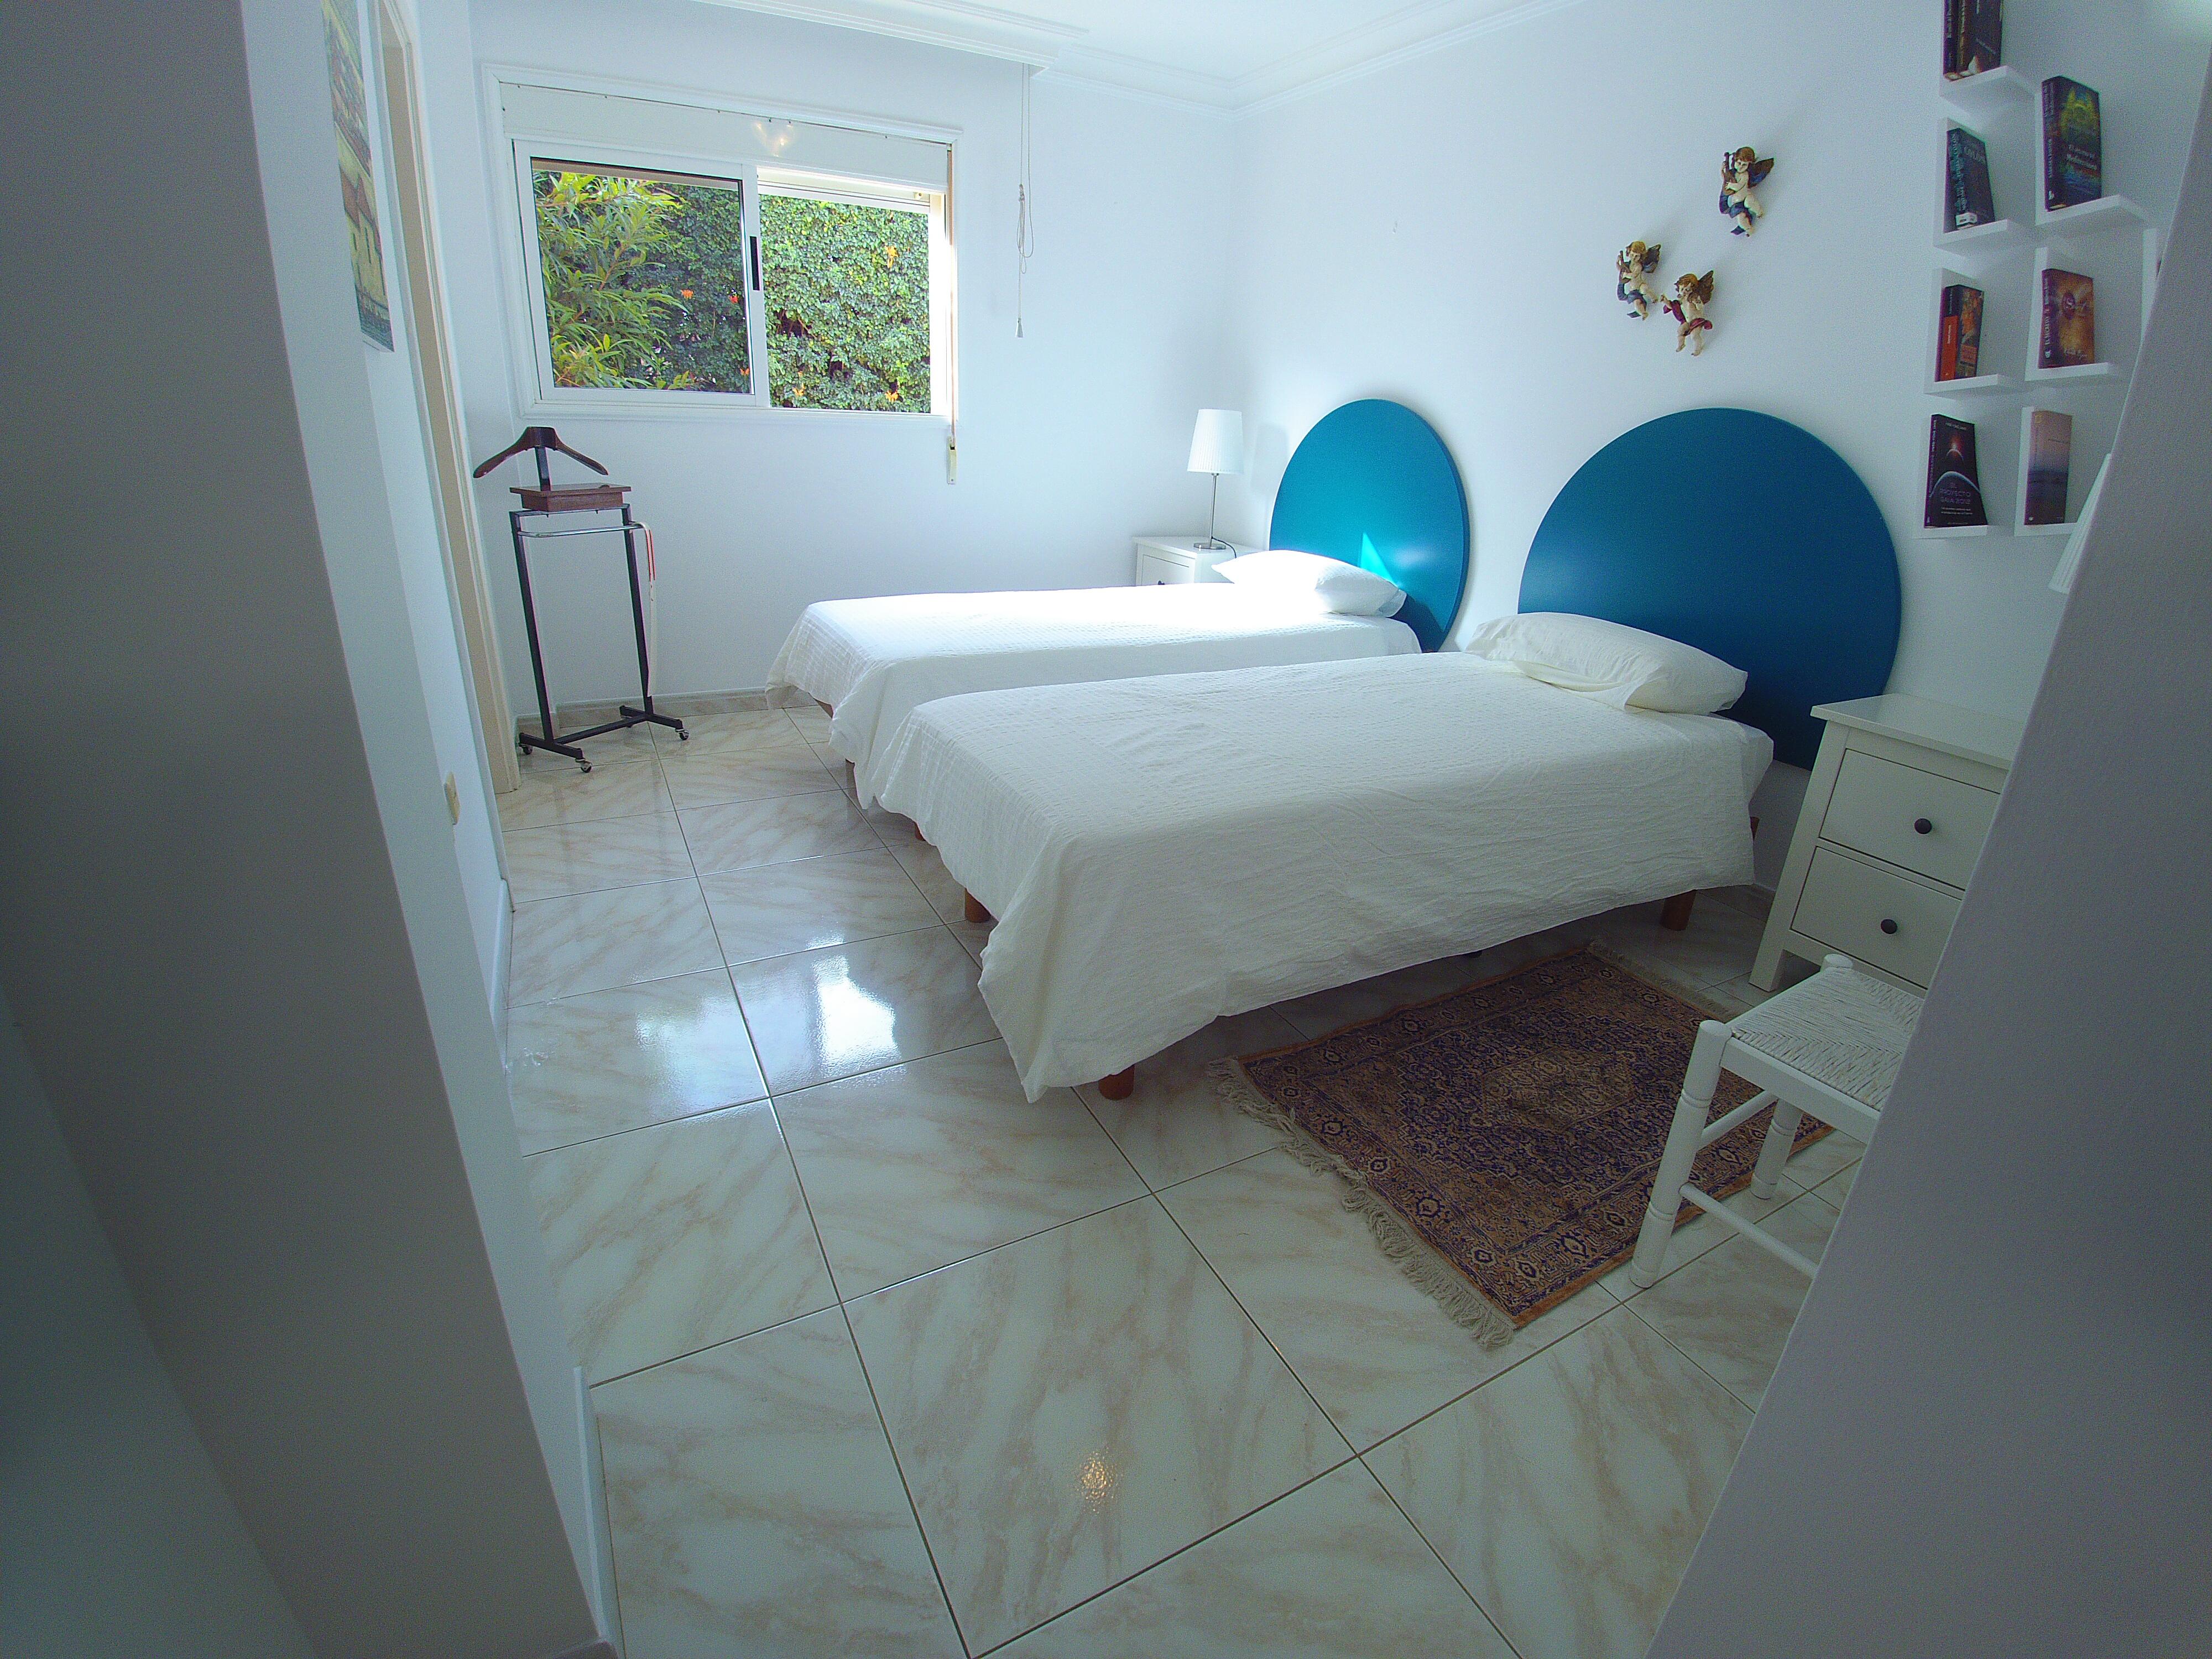 Maison de vacances Villa Primavera beheizbarer Pool kostenloses Wifi Grill (2125225), El Sauzal, Ténérife, Iles Canaries, Espagne, image 13